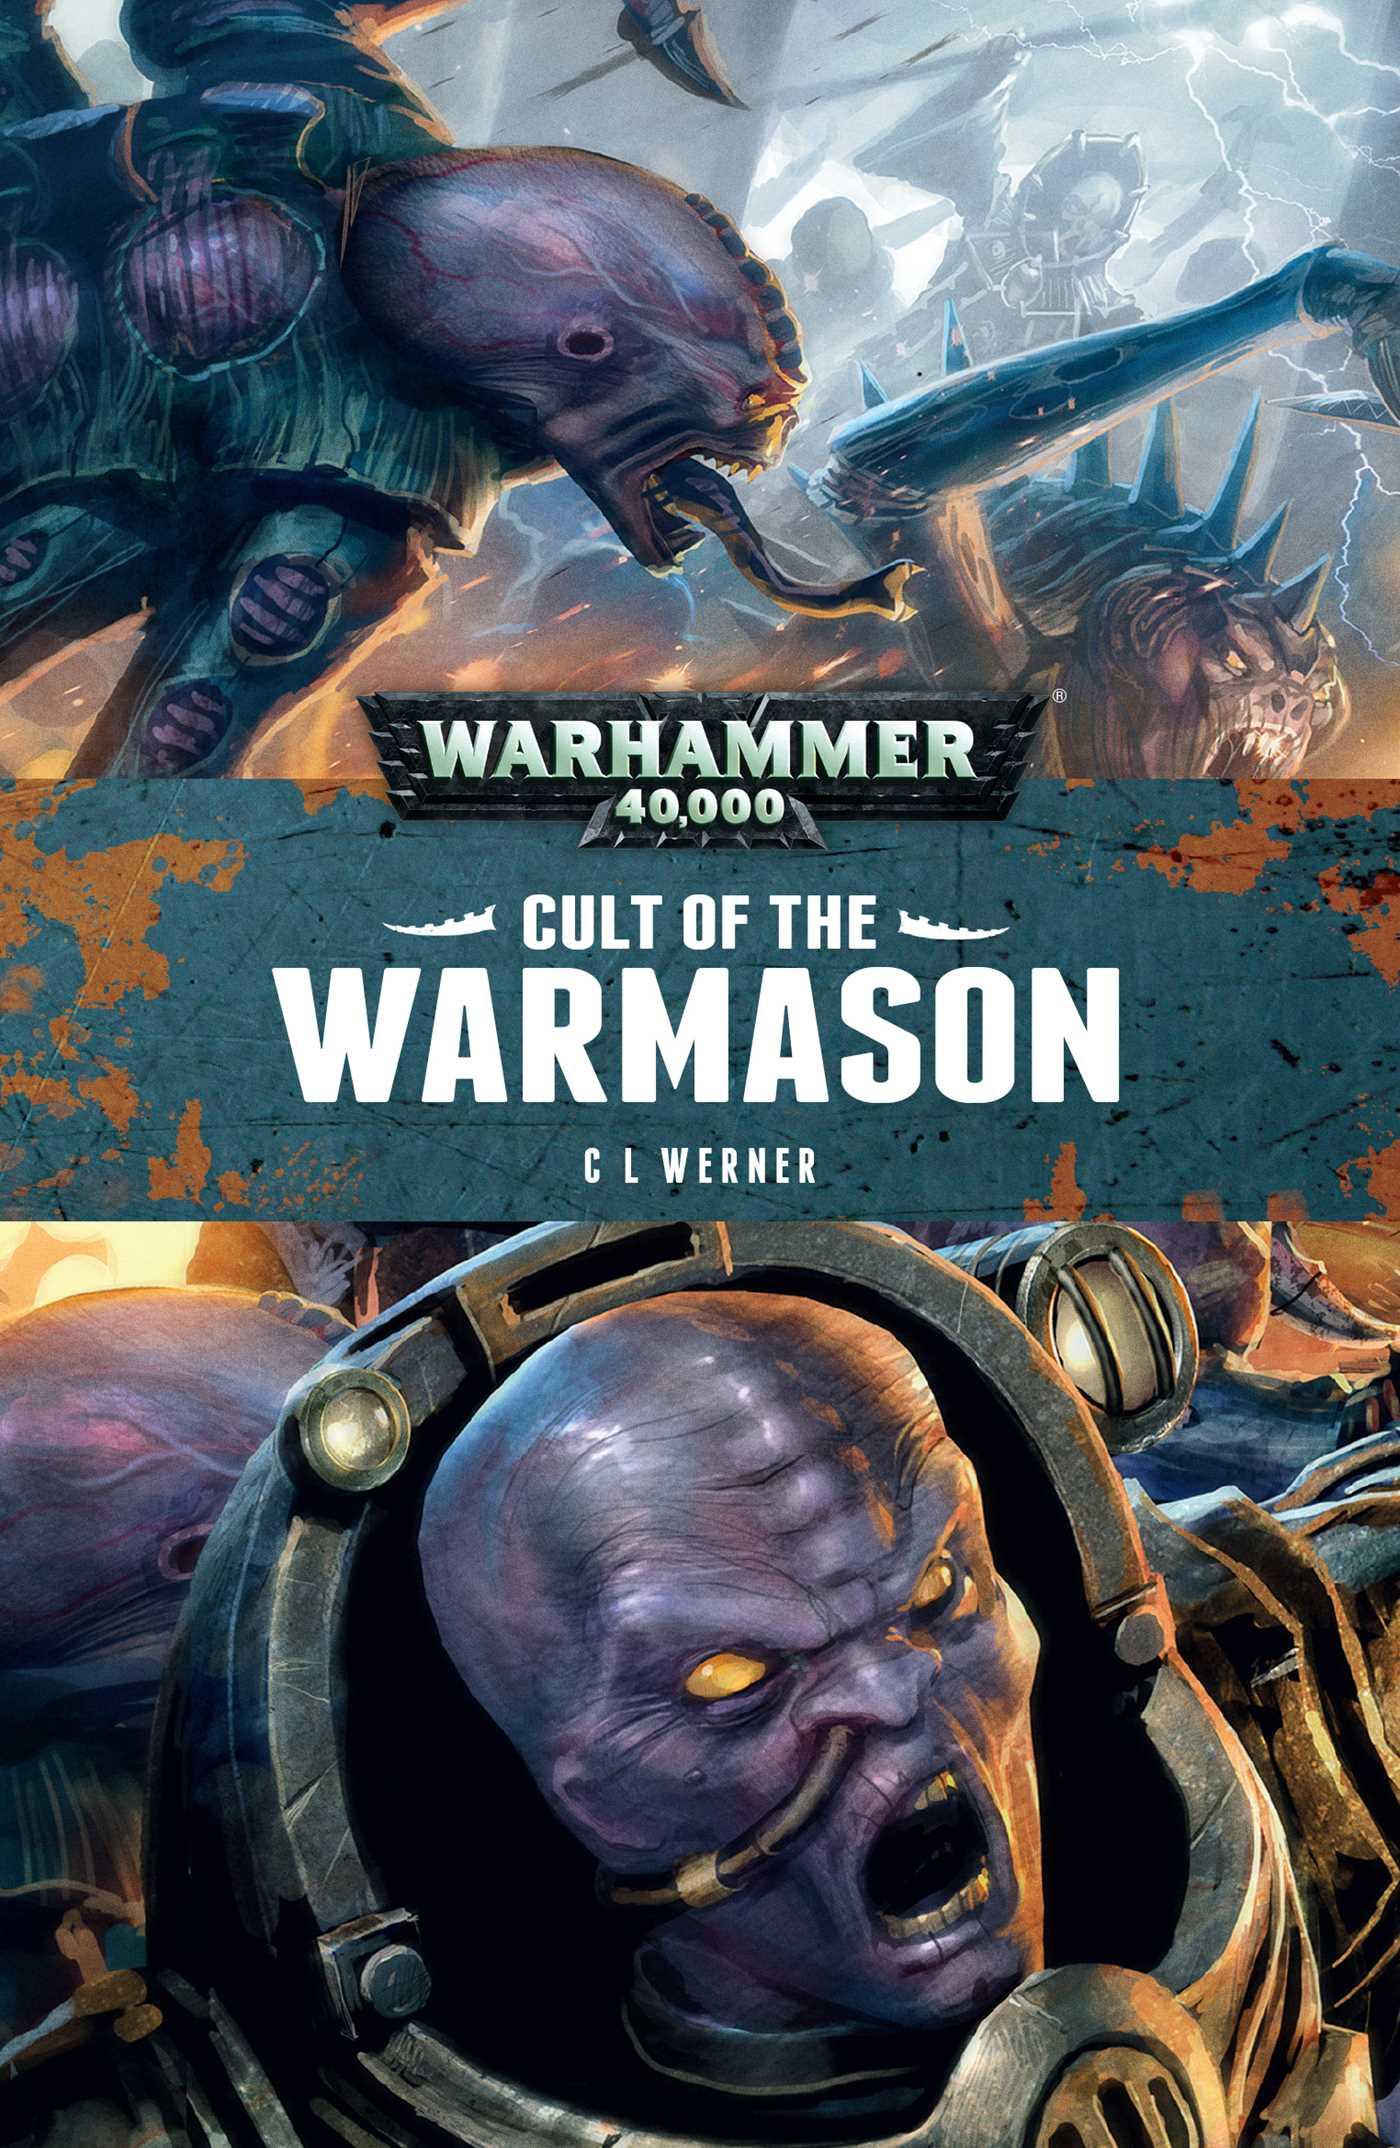 Cult of the warmason 9781784966140 hr